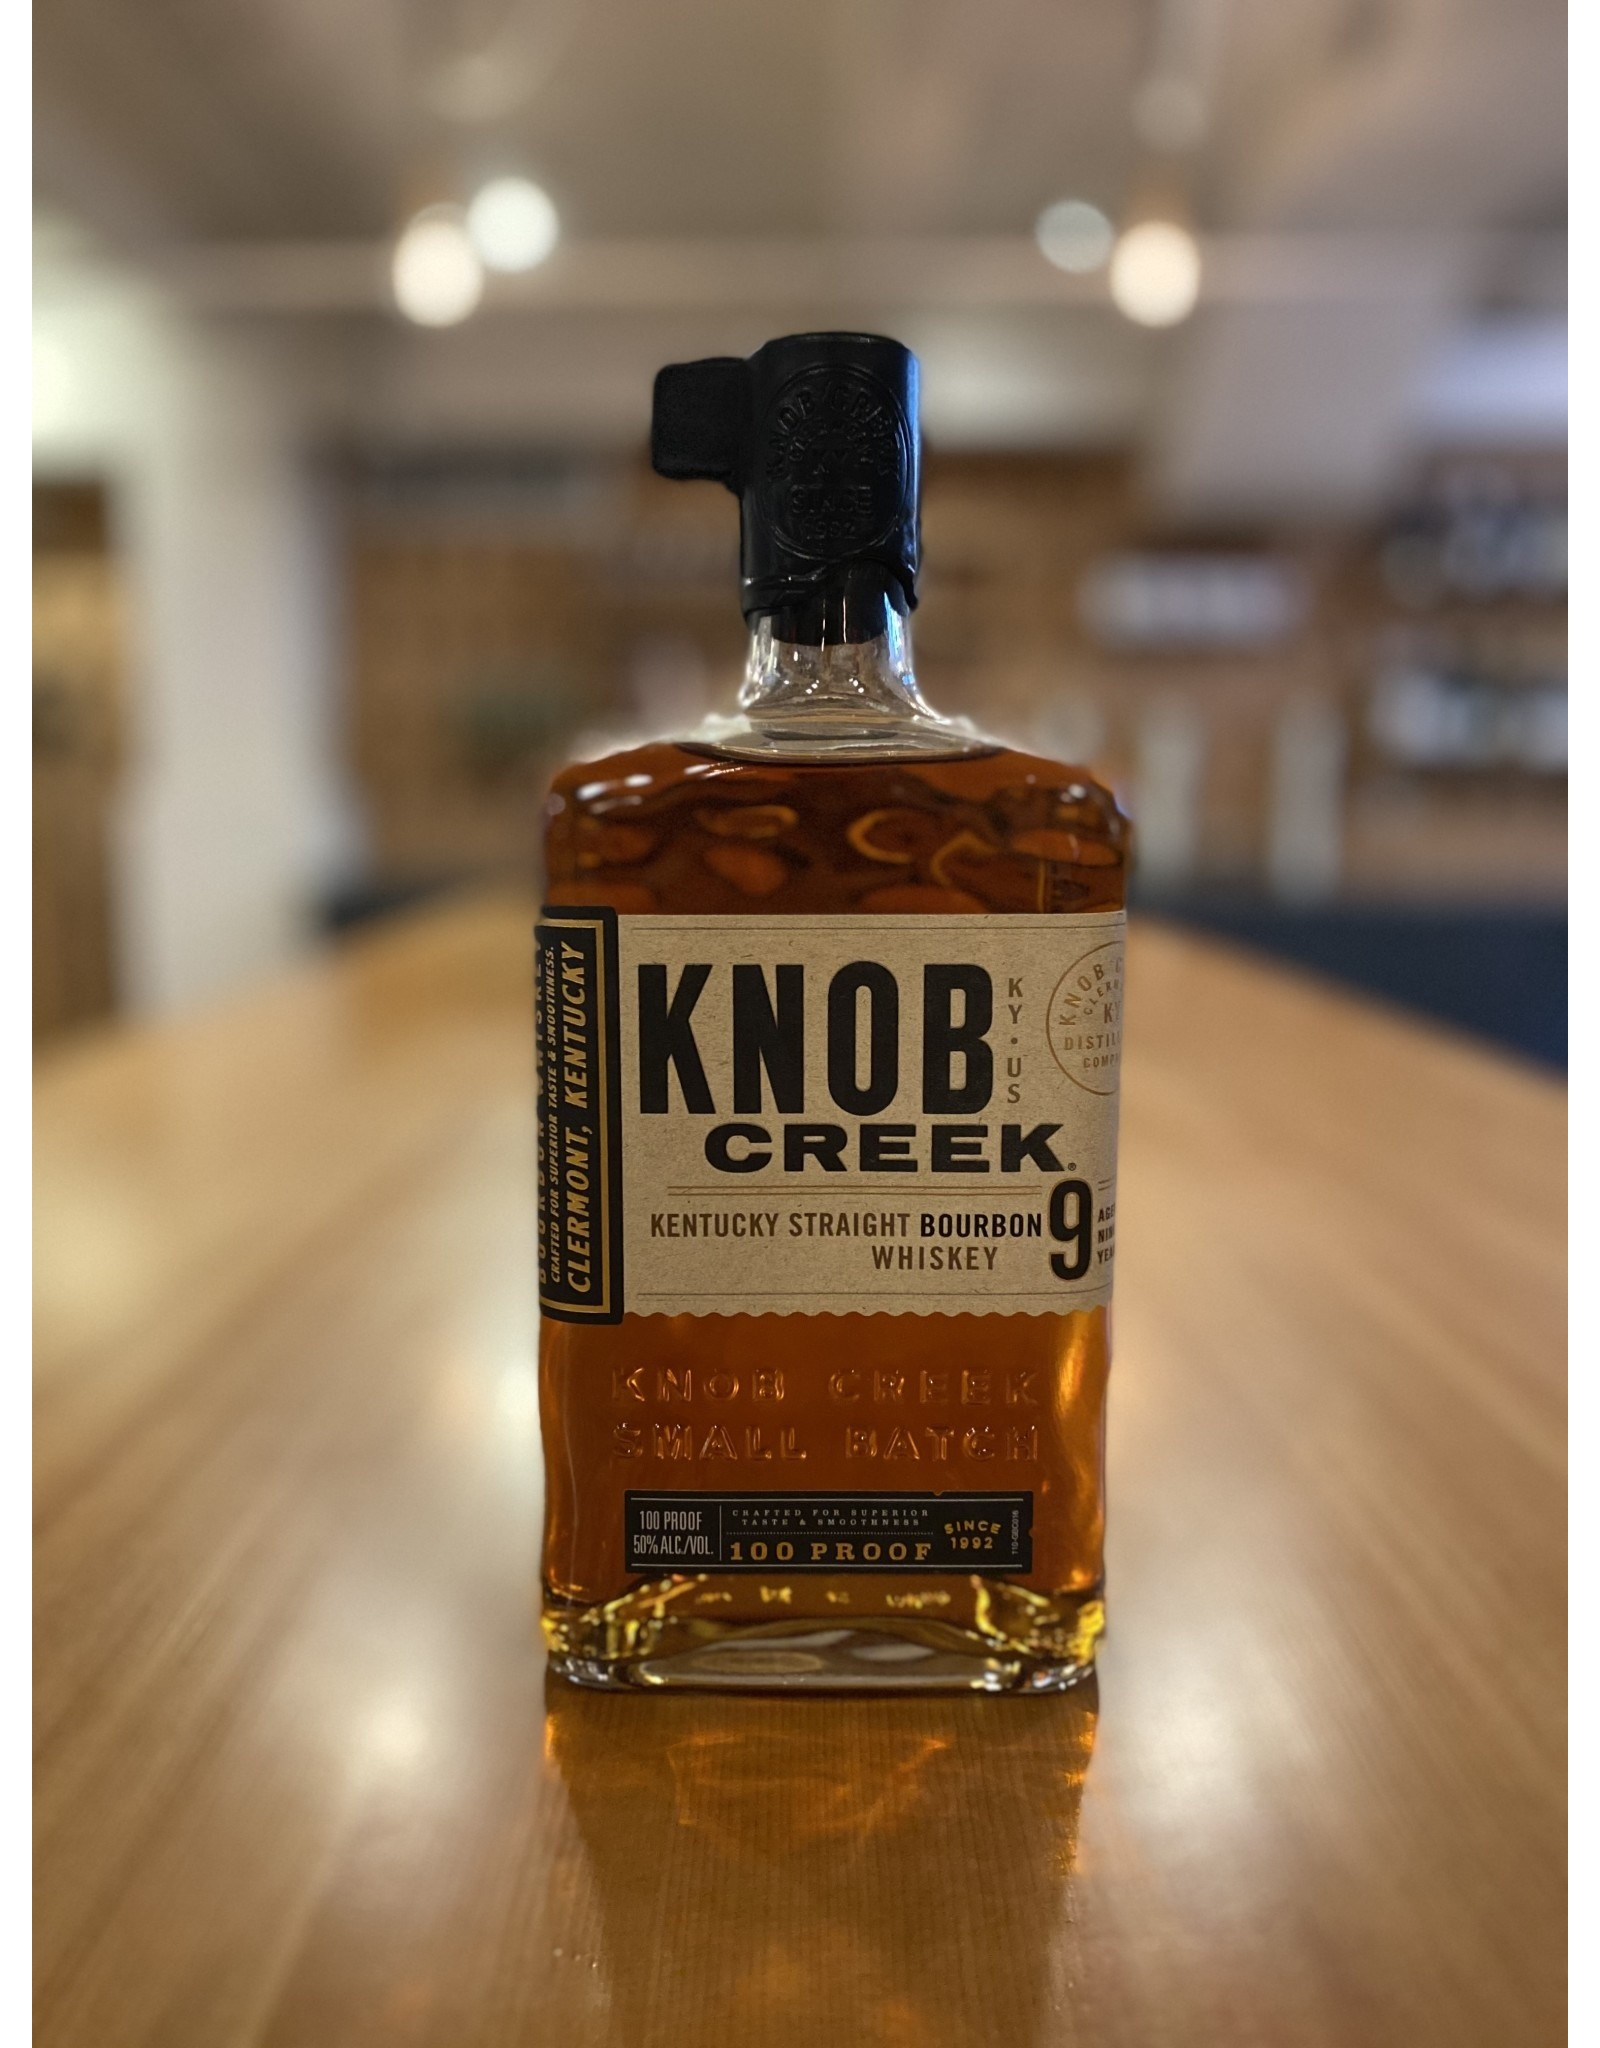 Knob Creek 9 Year Old Small Batch Straight Bourbon Whiskey 750ml - Kentucky